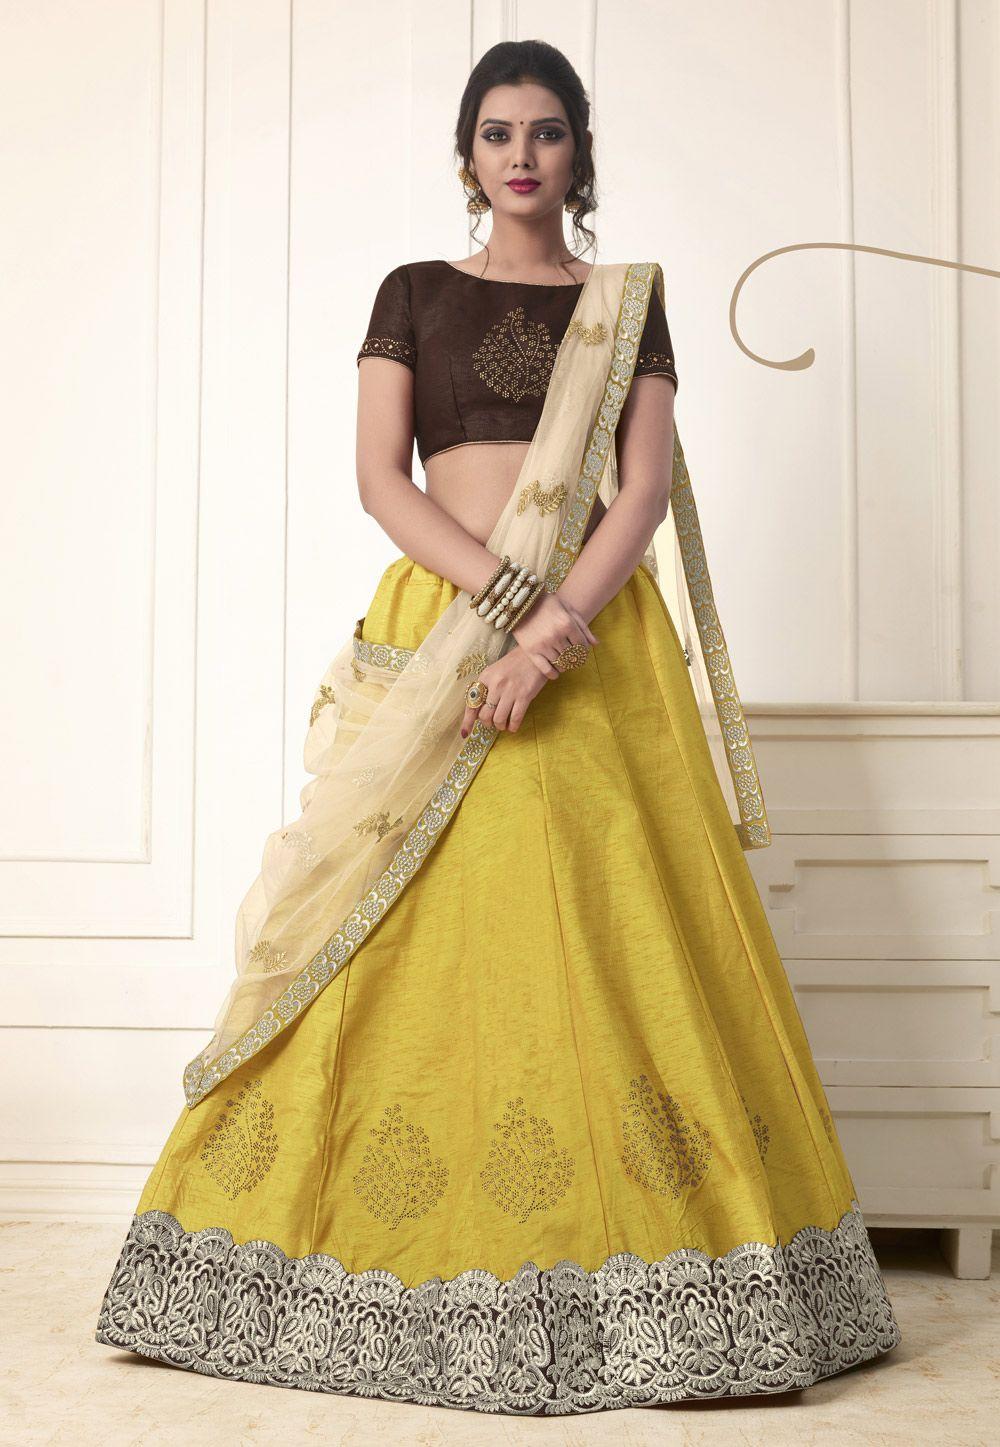 22cc5ce2f4 Buy Yellow Banglori Silk Lehenga Choli 154322 online at best price from  vast collection of Lehenga Choli and Chaniya Choli at Indianclothstore.com.